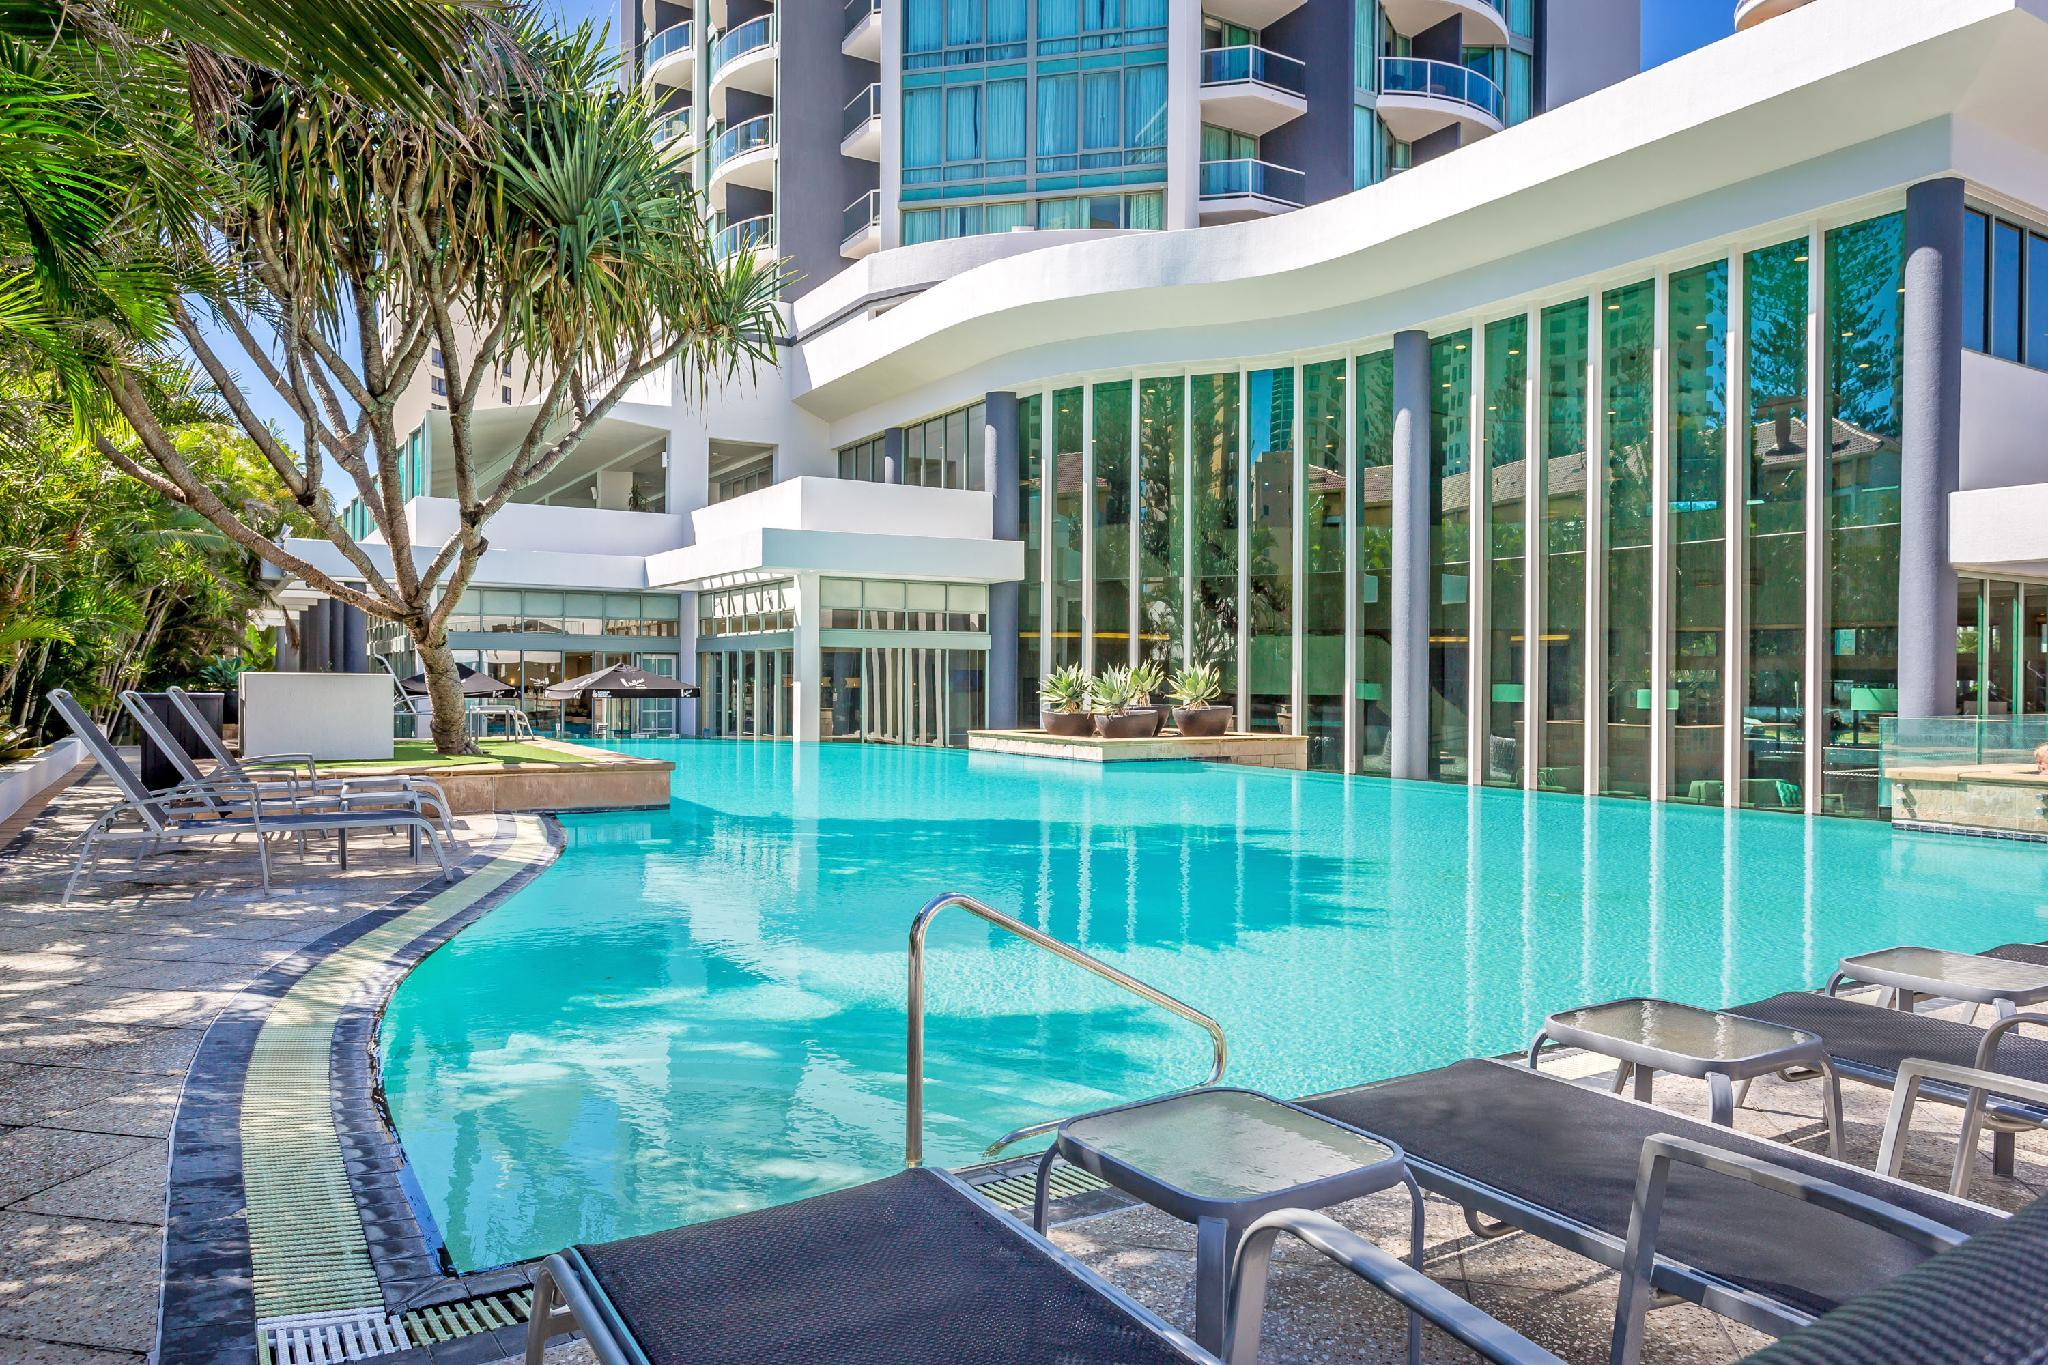 Mantra Legends Hotel Gold Coast 5 Star Hotel In Gold Coast Australia